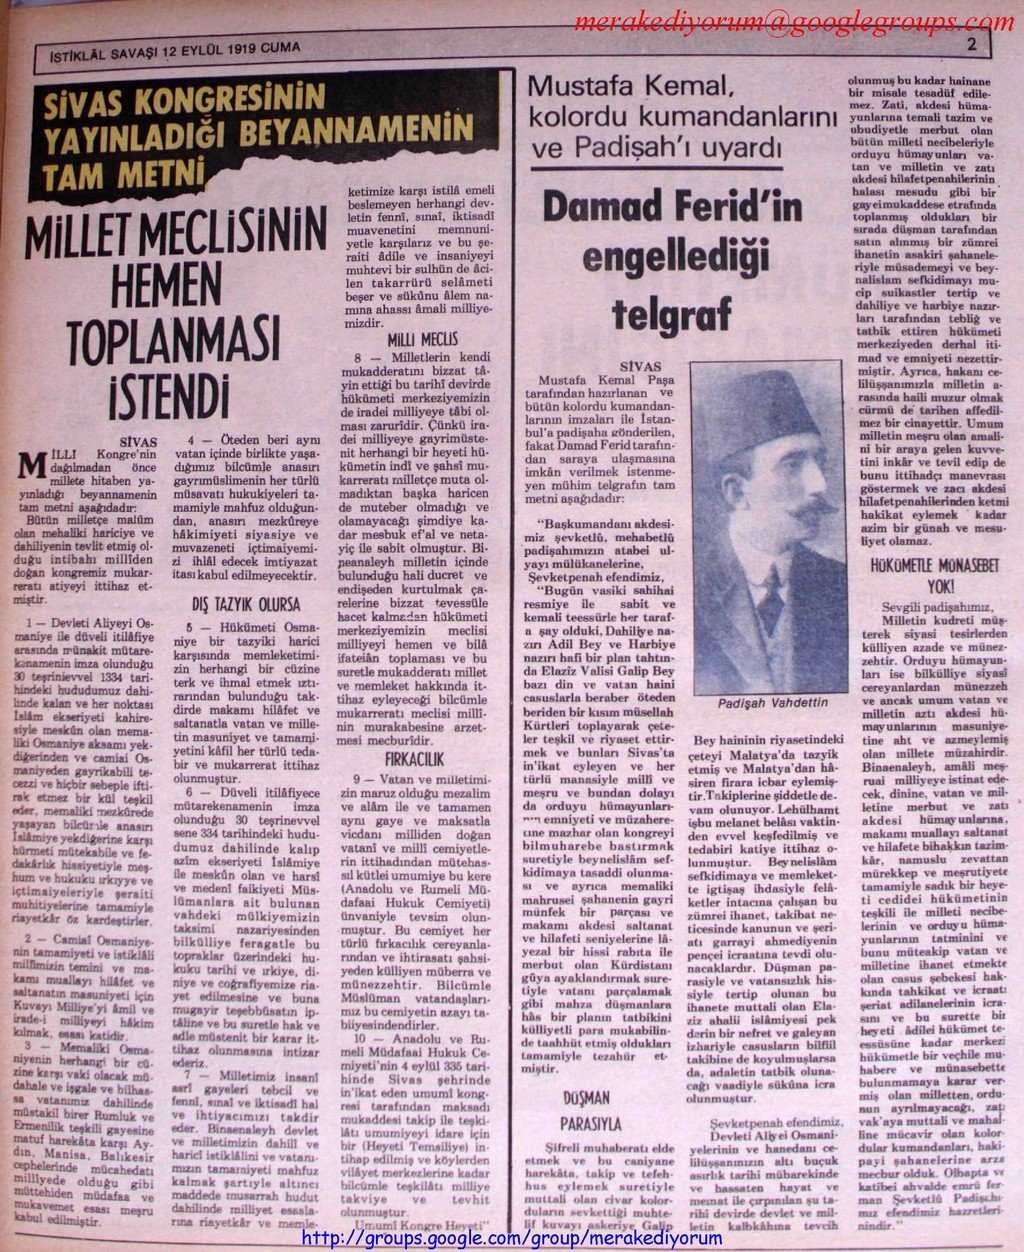 istiklal savaşı gazetesi - 12 eylül 1919